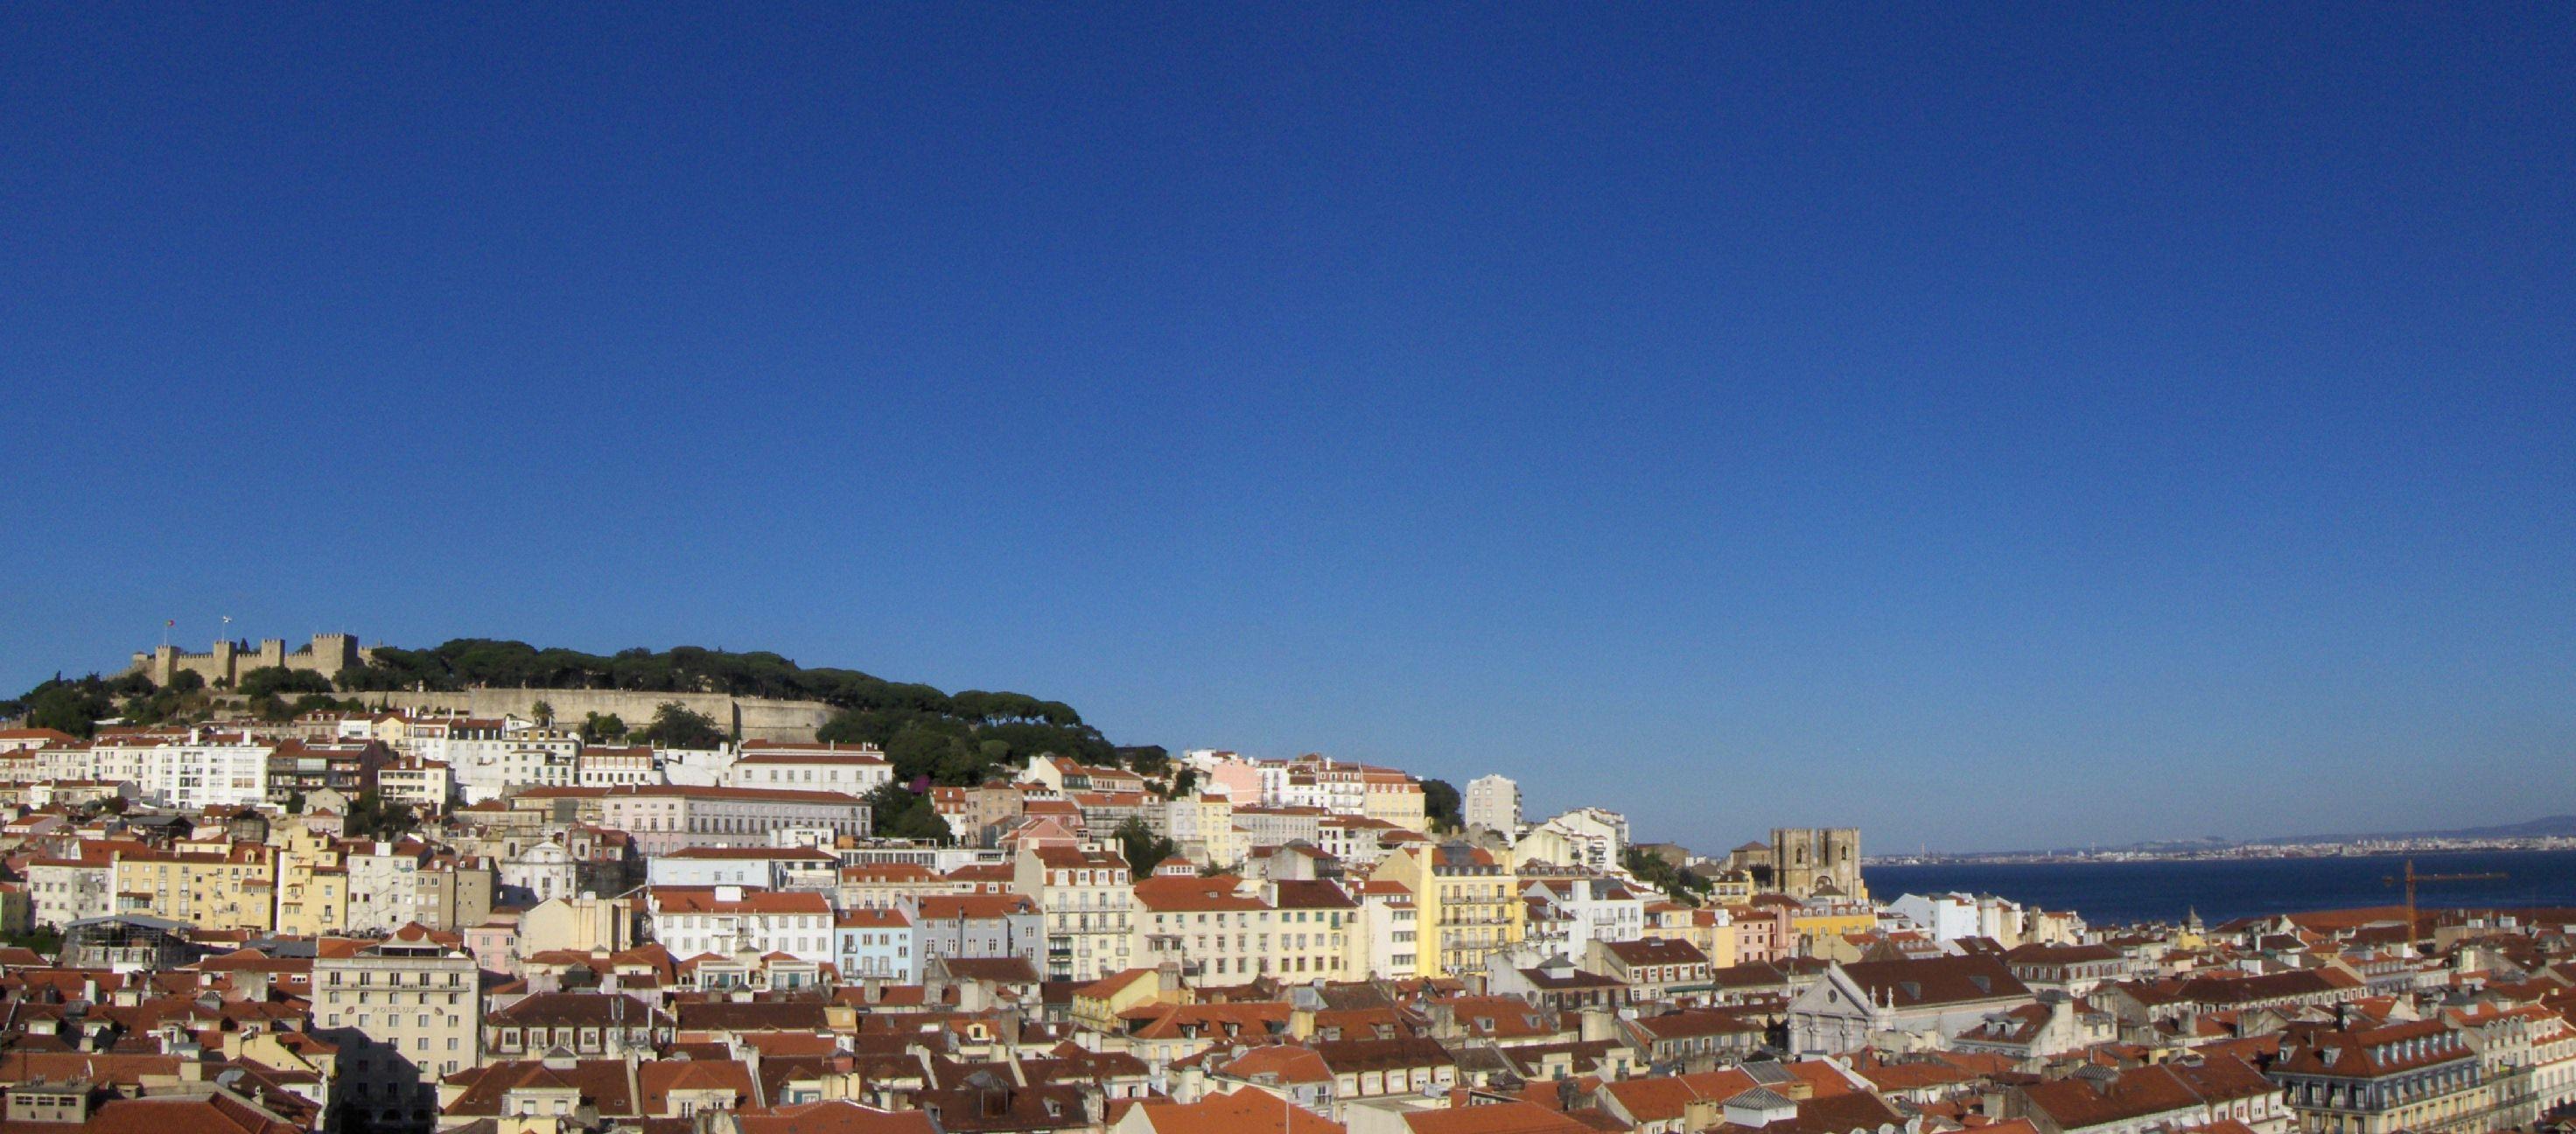 Panoramica de Lisboa by virtualpat.deviantart.com on @deviantART